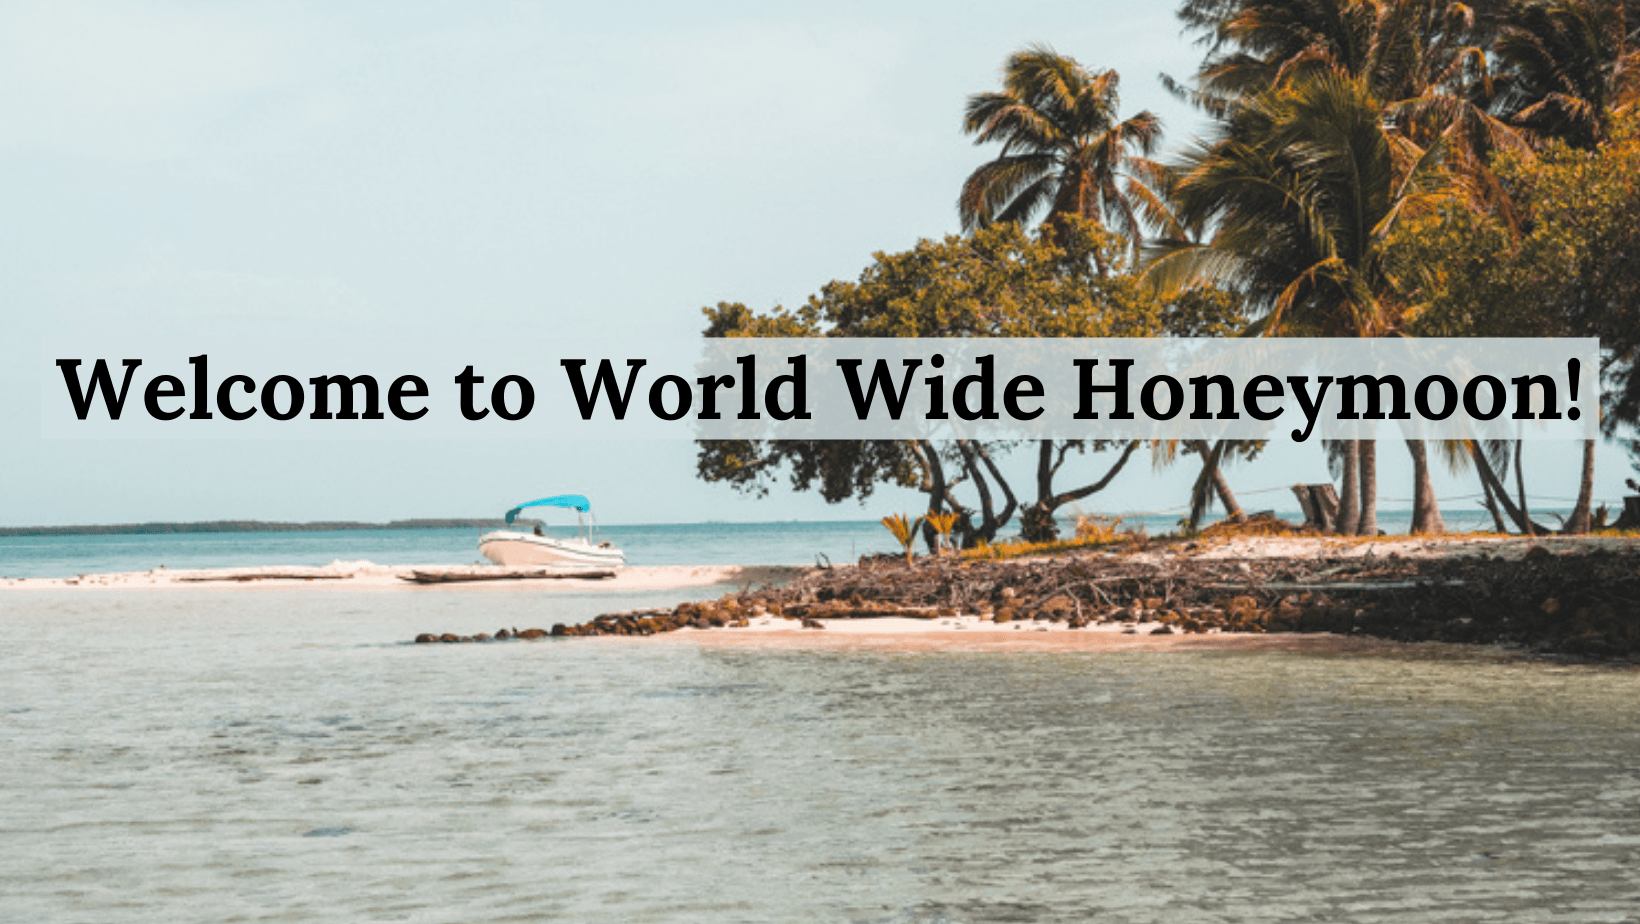 Welcome to World Wide Honeymoon!